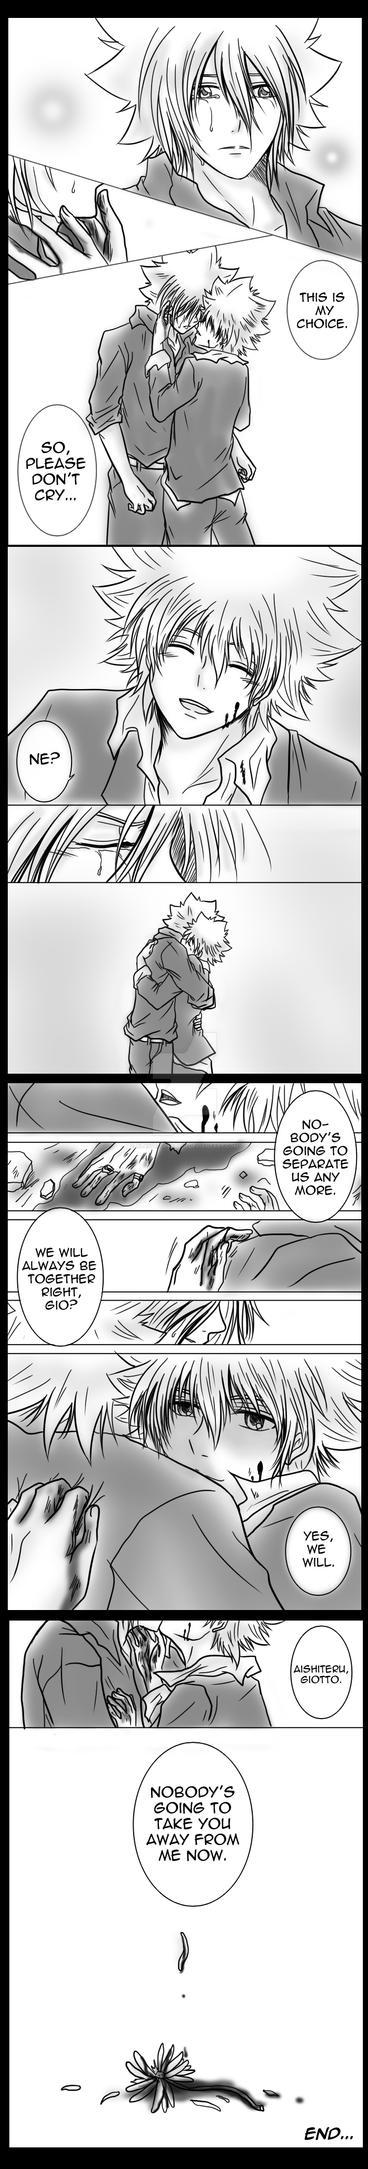 G27 - My Choice Comic by Alasse-Tasartir